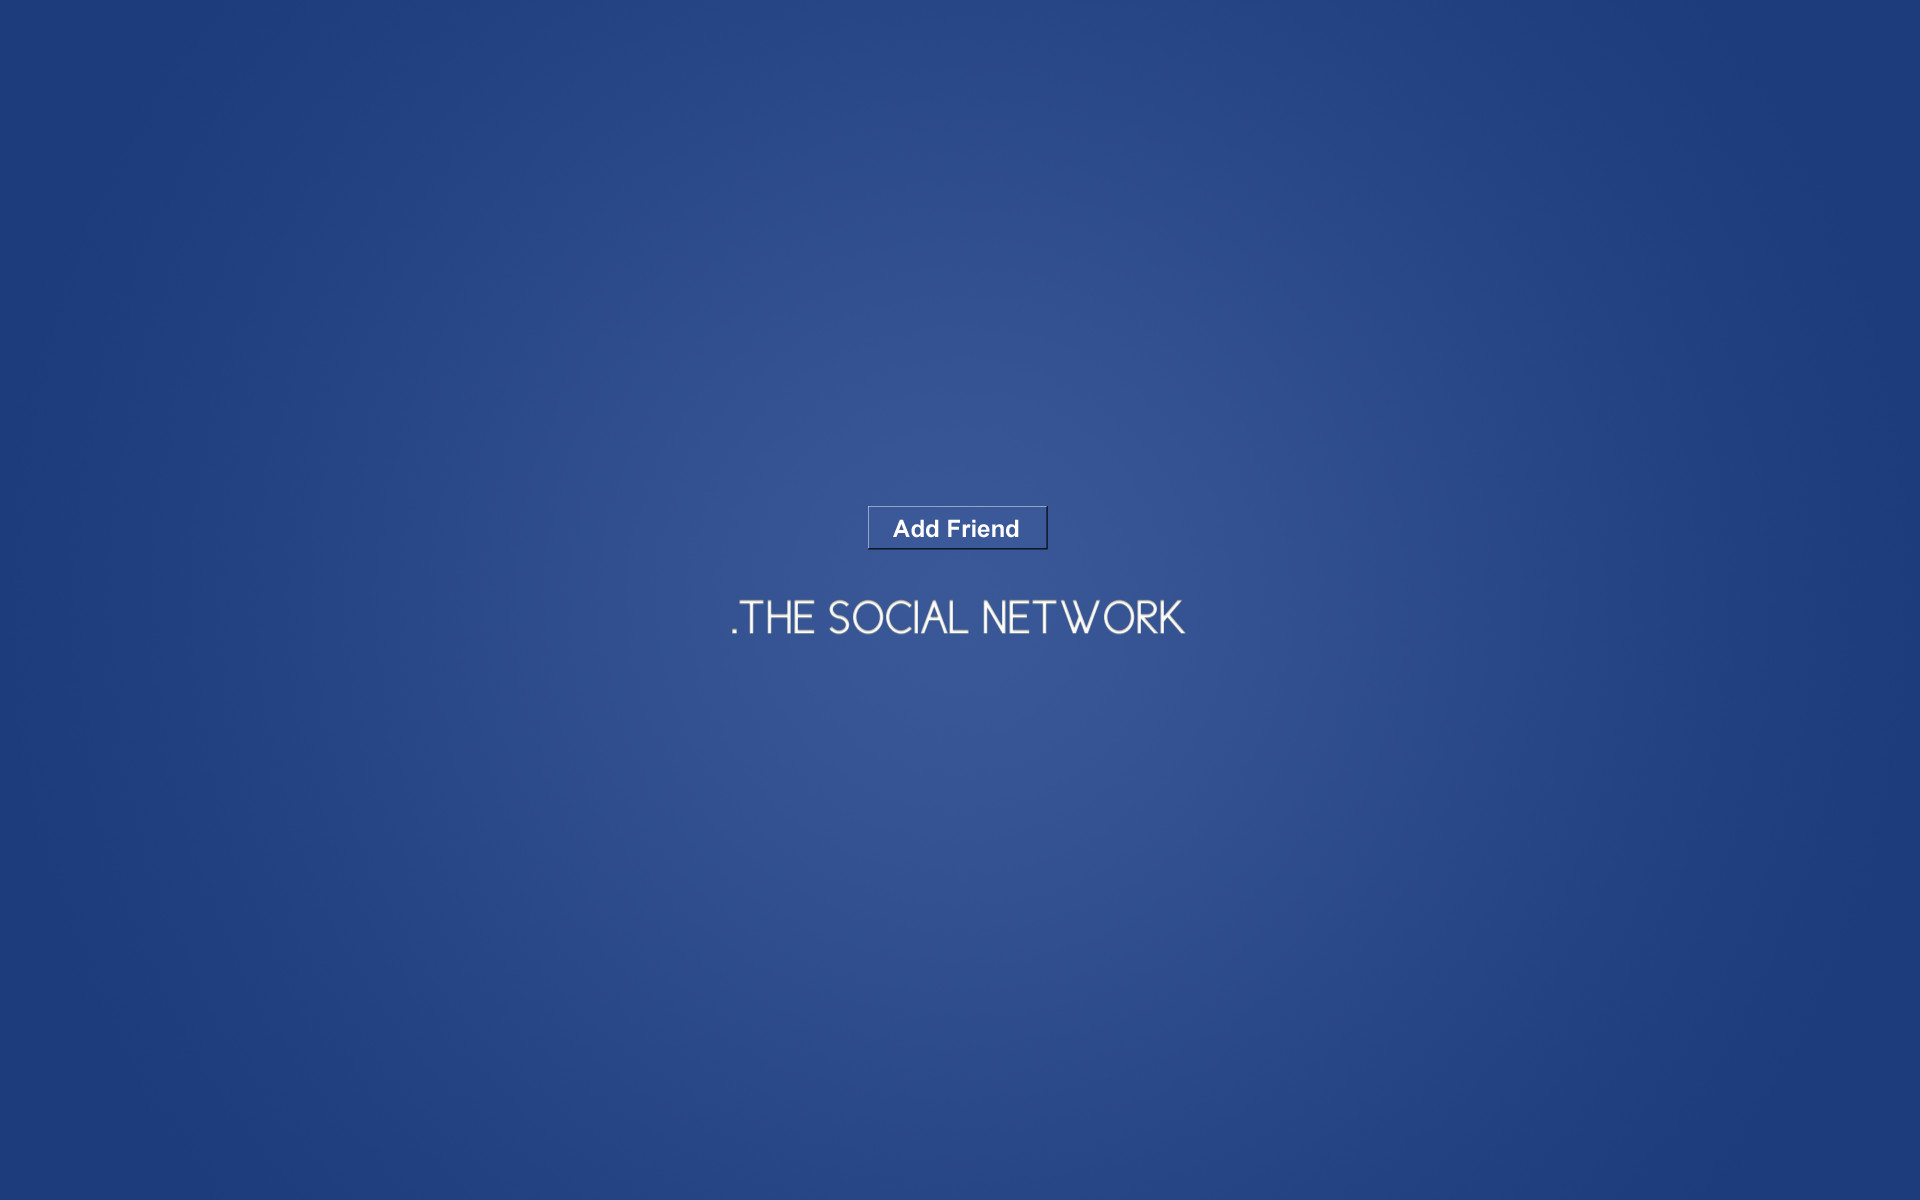 The Social Network Computer Wallpapers, Desktop Backgrounds .